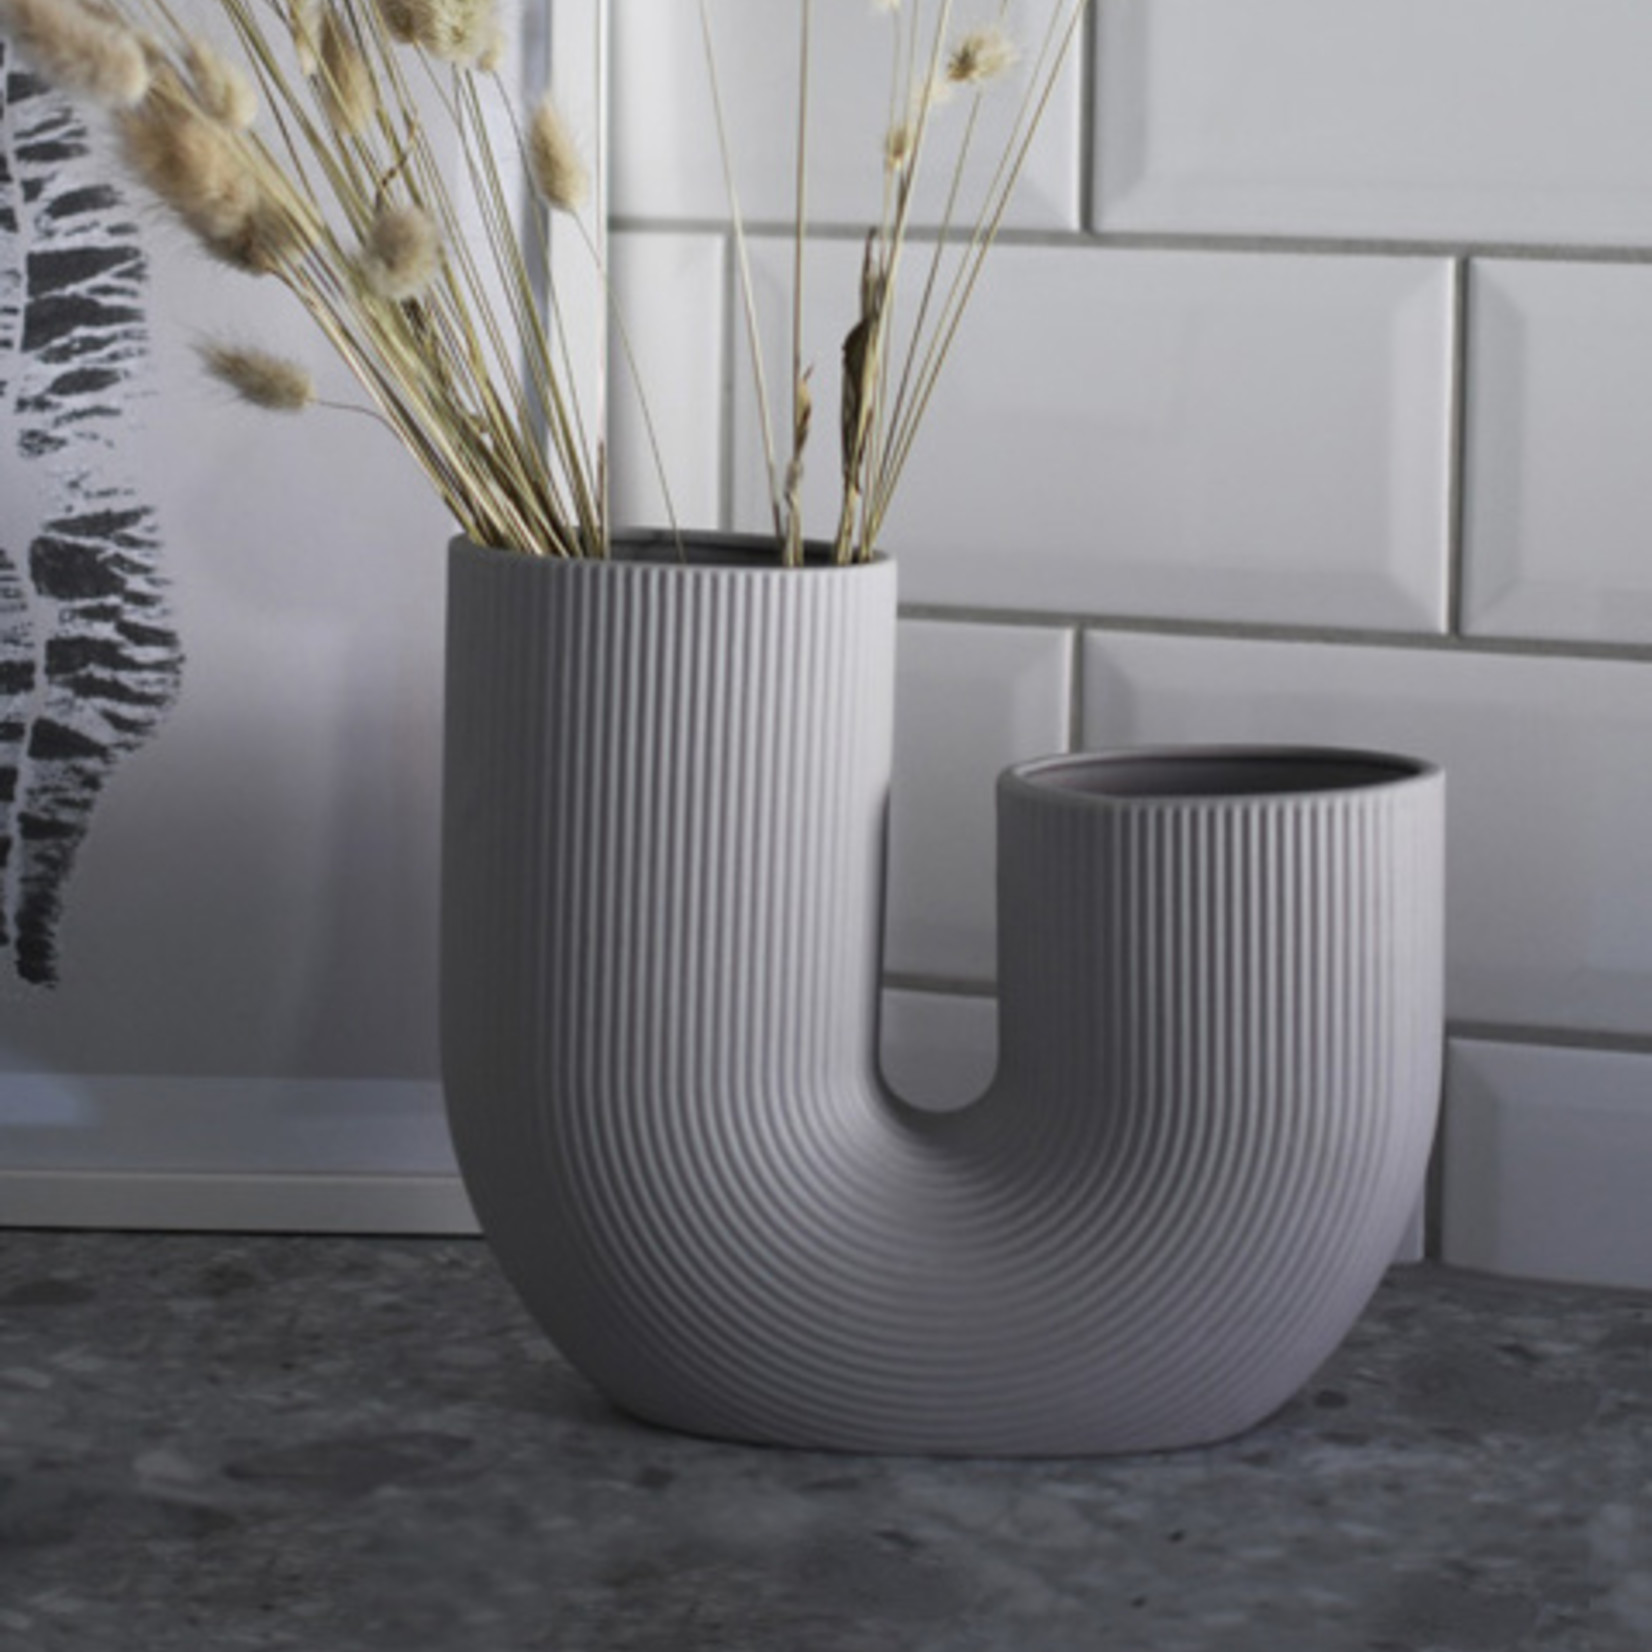 Storefactory  Vase Stravalla grau